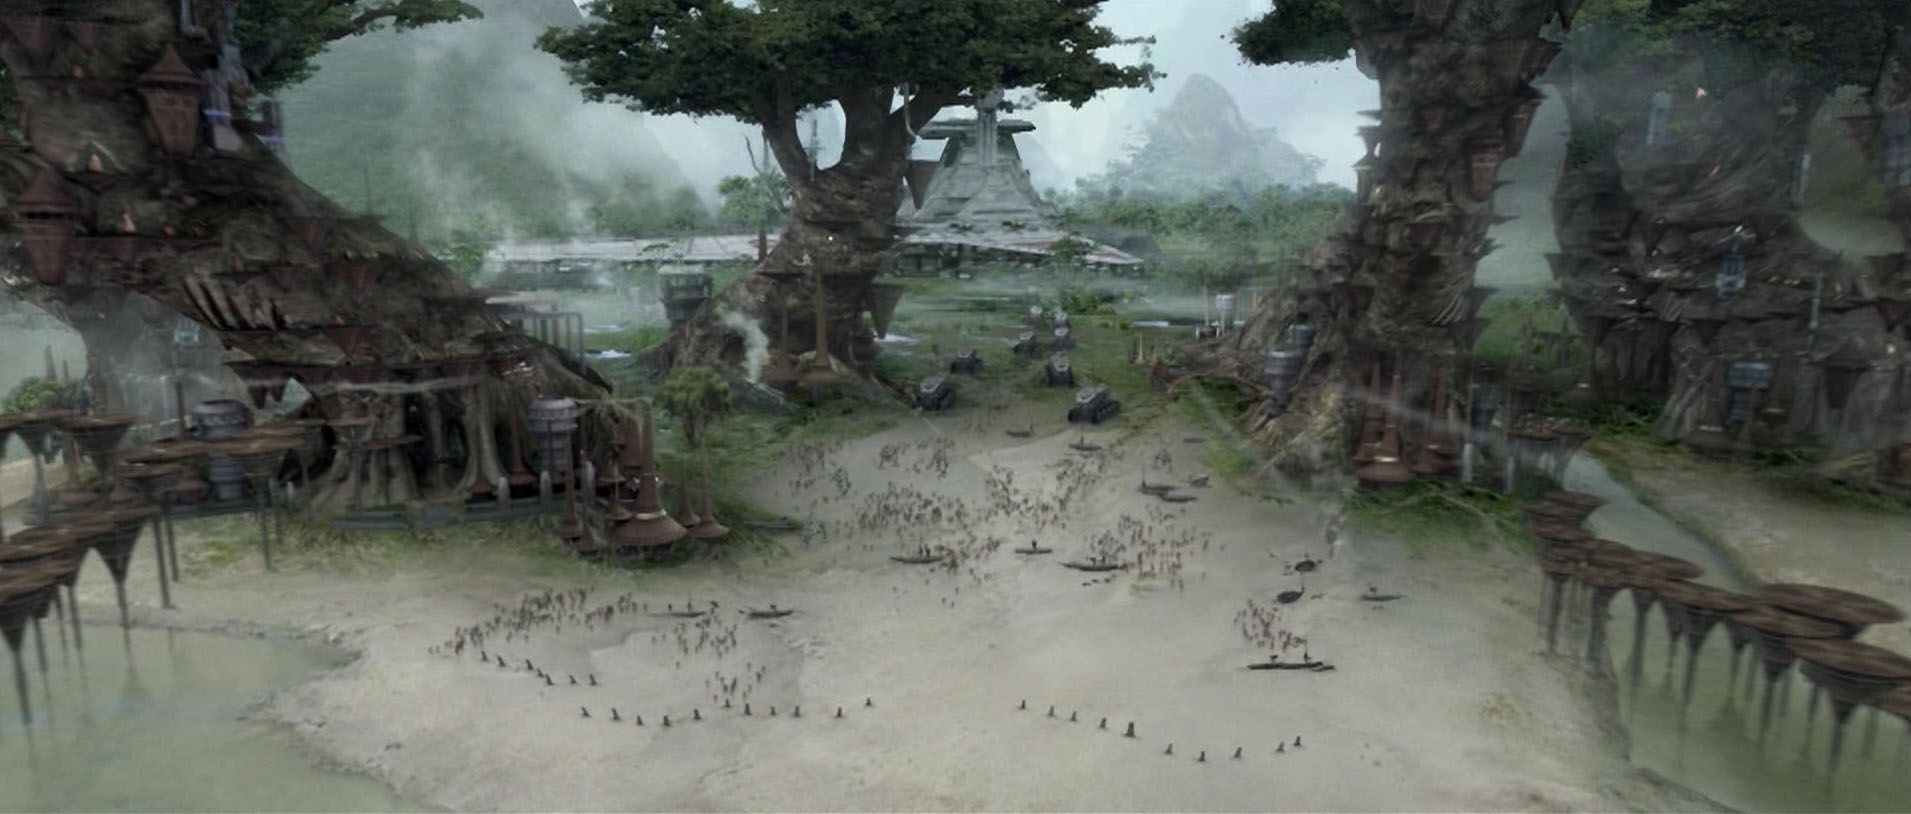 Revenge Of The Sith Battle Of Kashyyyk Star Wars Canon Star Wars Battlefront Star Wars